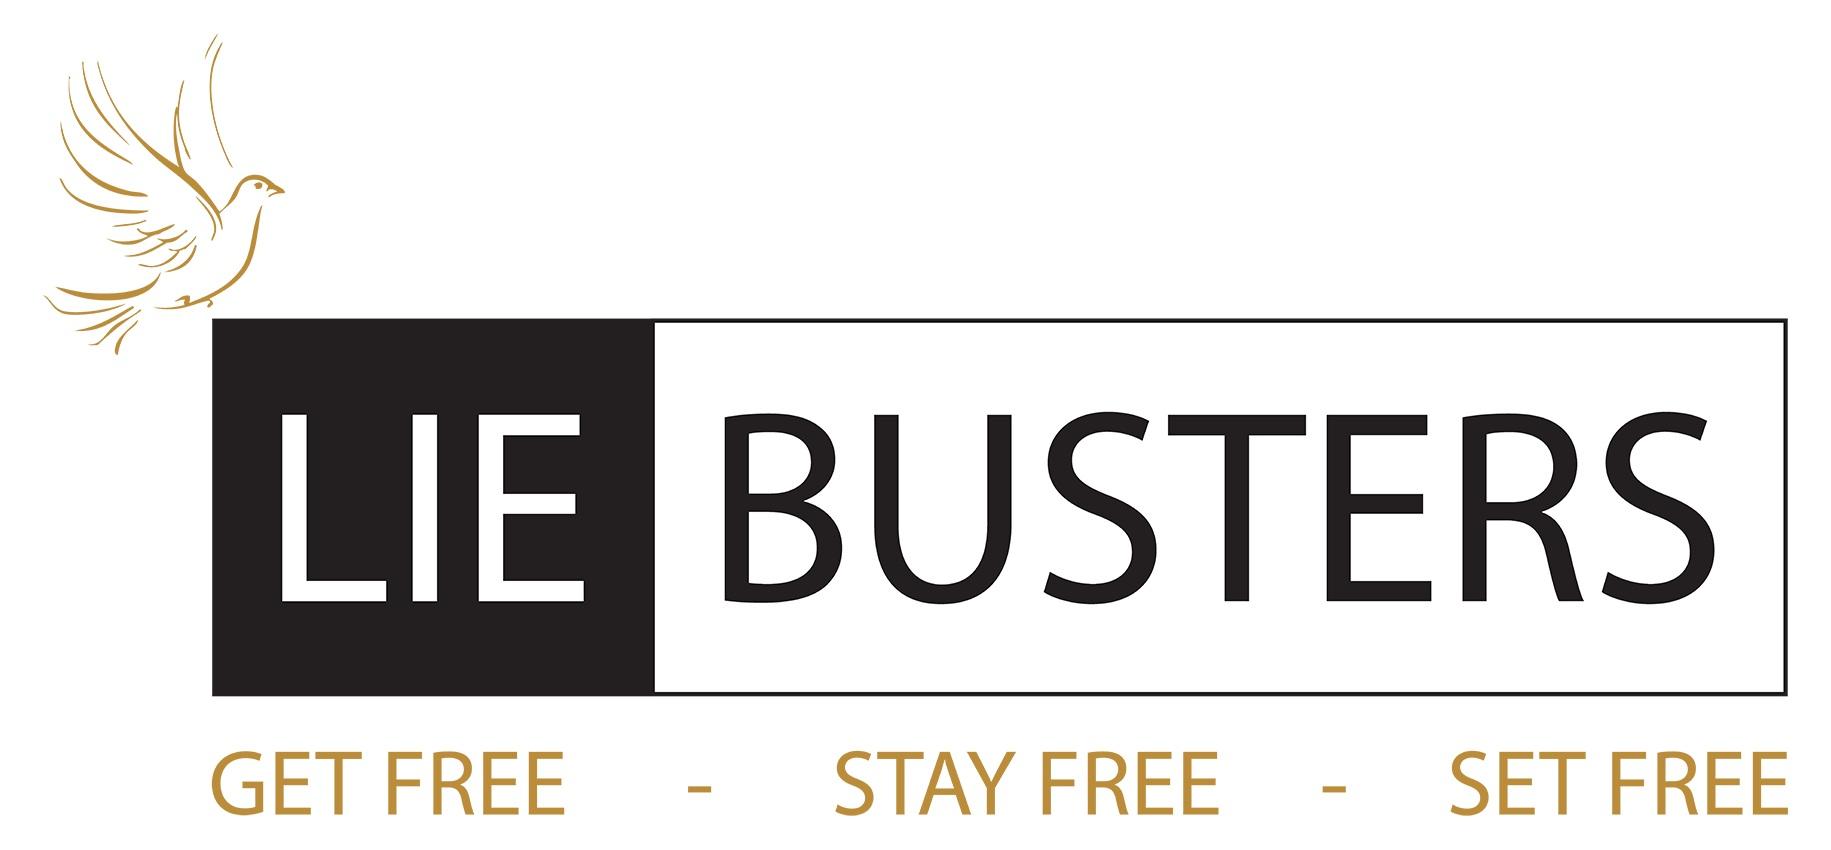 Liebusters+Logo+Gold+2+%281%29.jpg